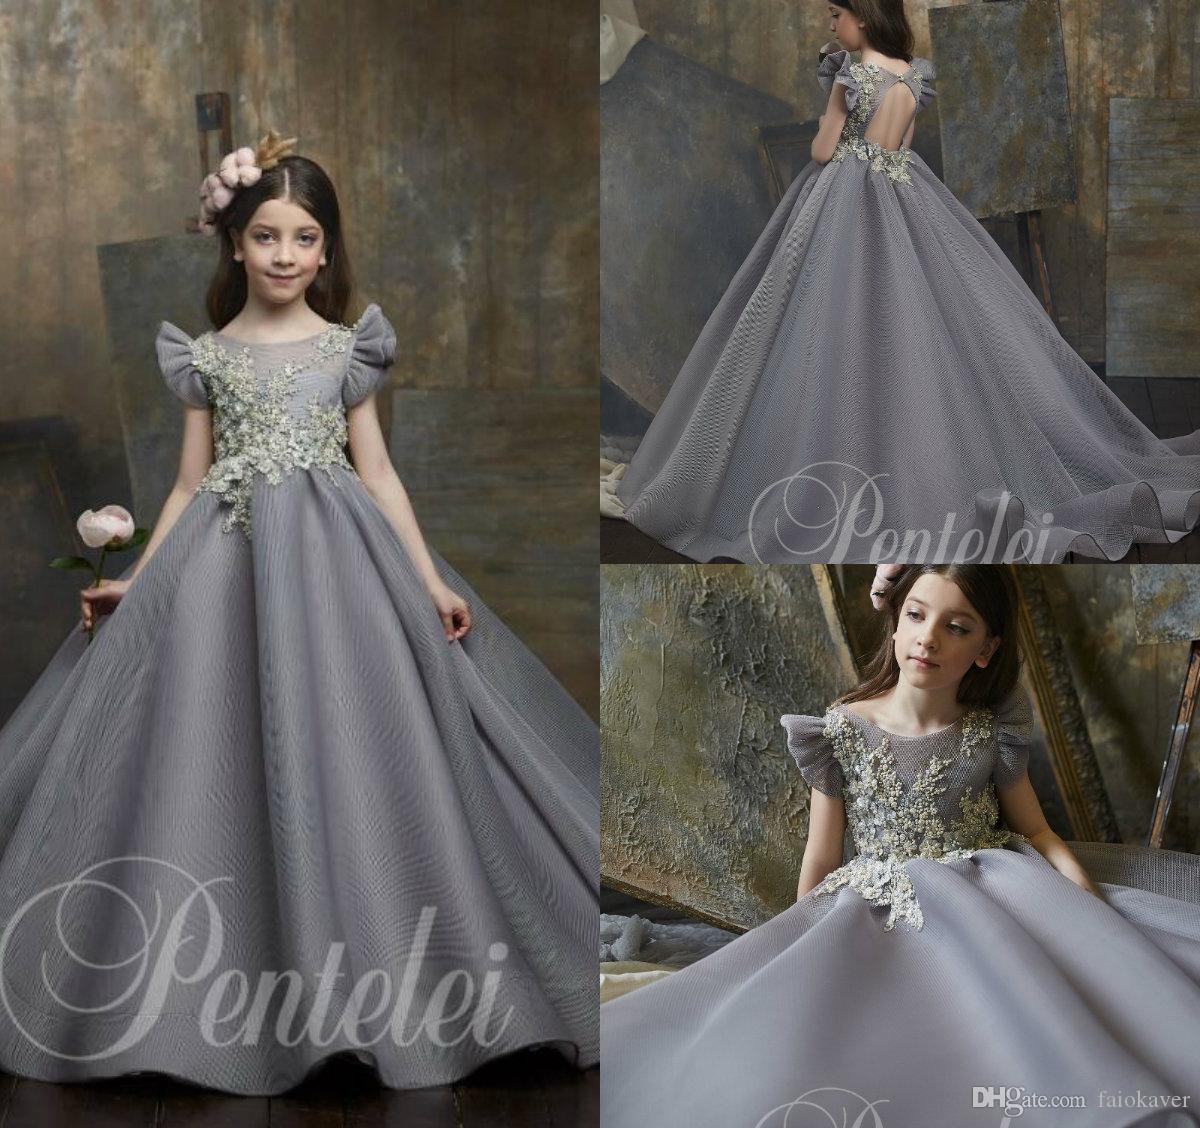 2020 Grey Flower Girl Dresses Jewel Neck Bead Appliqued Cap Sleeve First Communion Dress Custom Made Elegant Girls Pageant Gowns